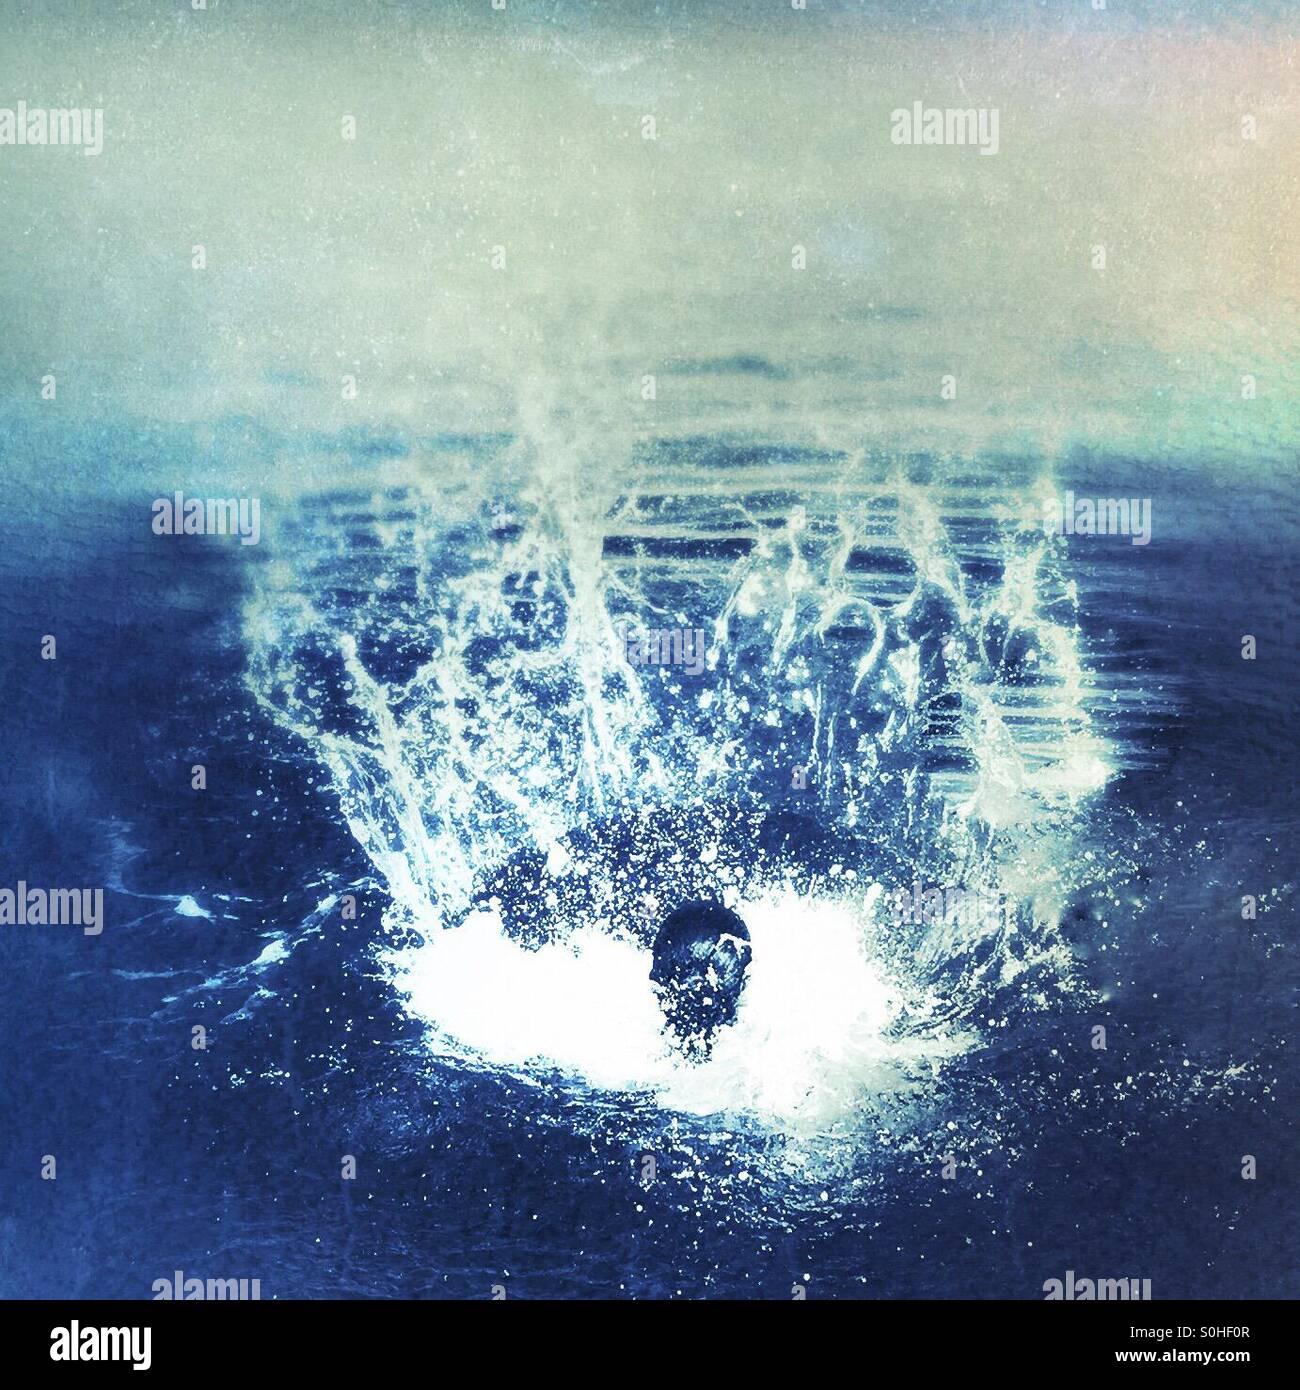 The big splash - Stock Image